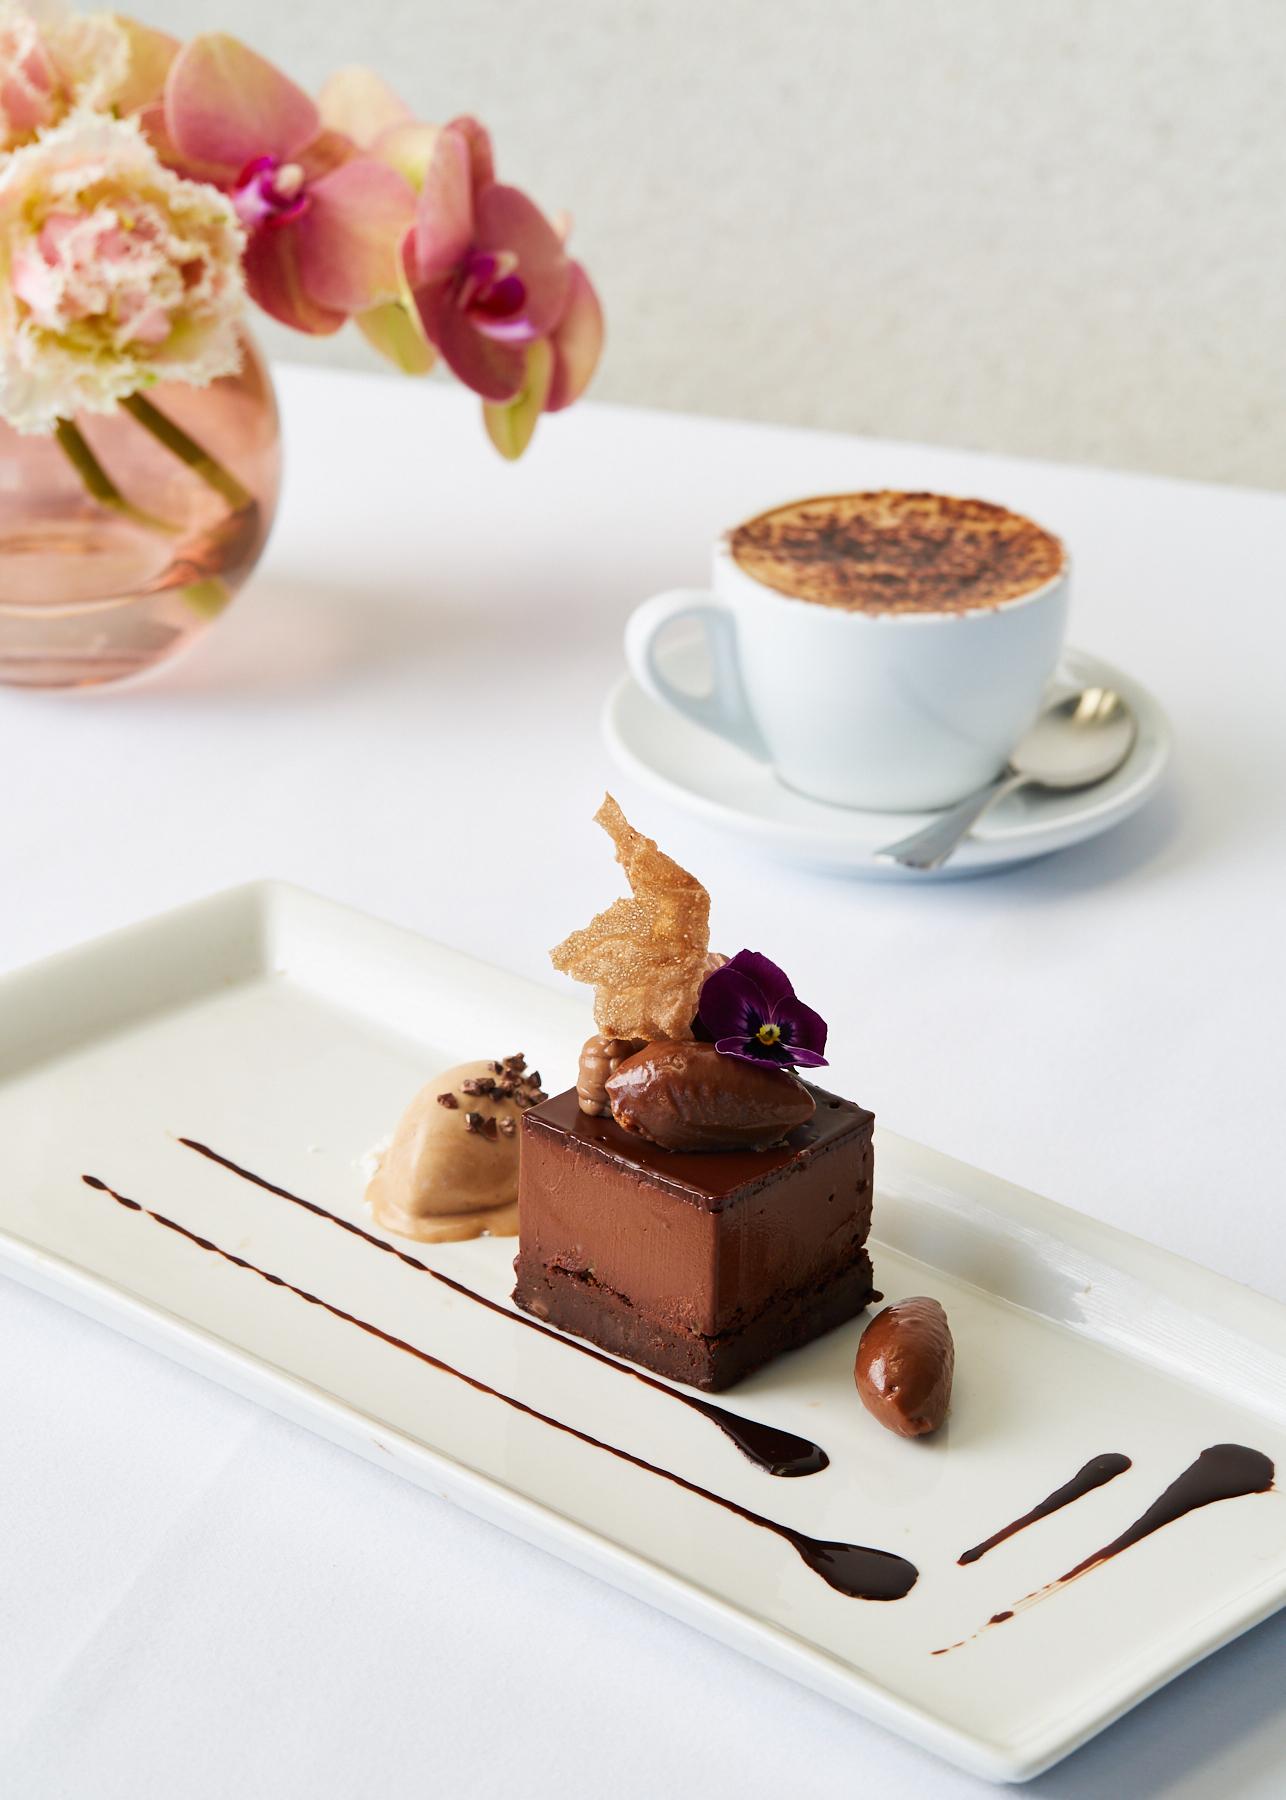 20170906_Entree-Main-Dessert_Catalina Spring_PM 63